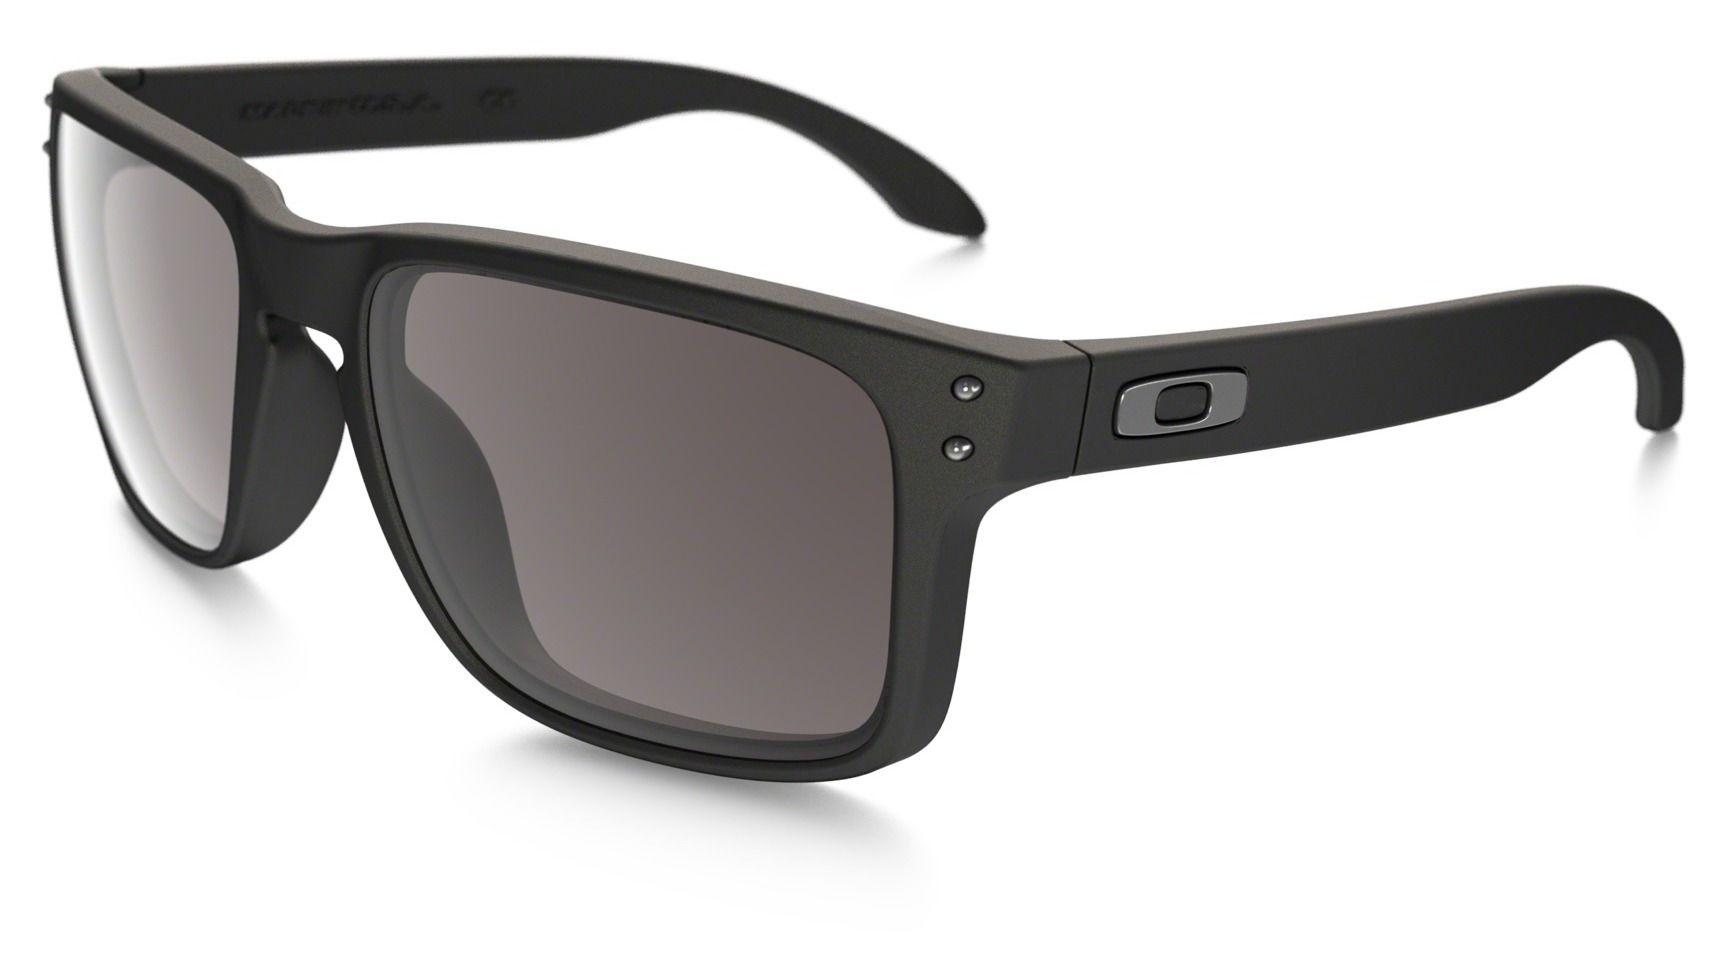 a6a8f647fc0 Oakley Holbrook Sunglasses - RevZilla